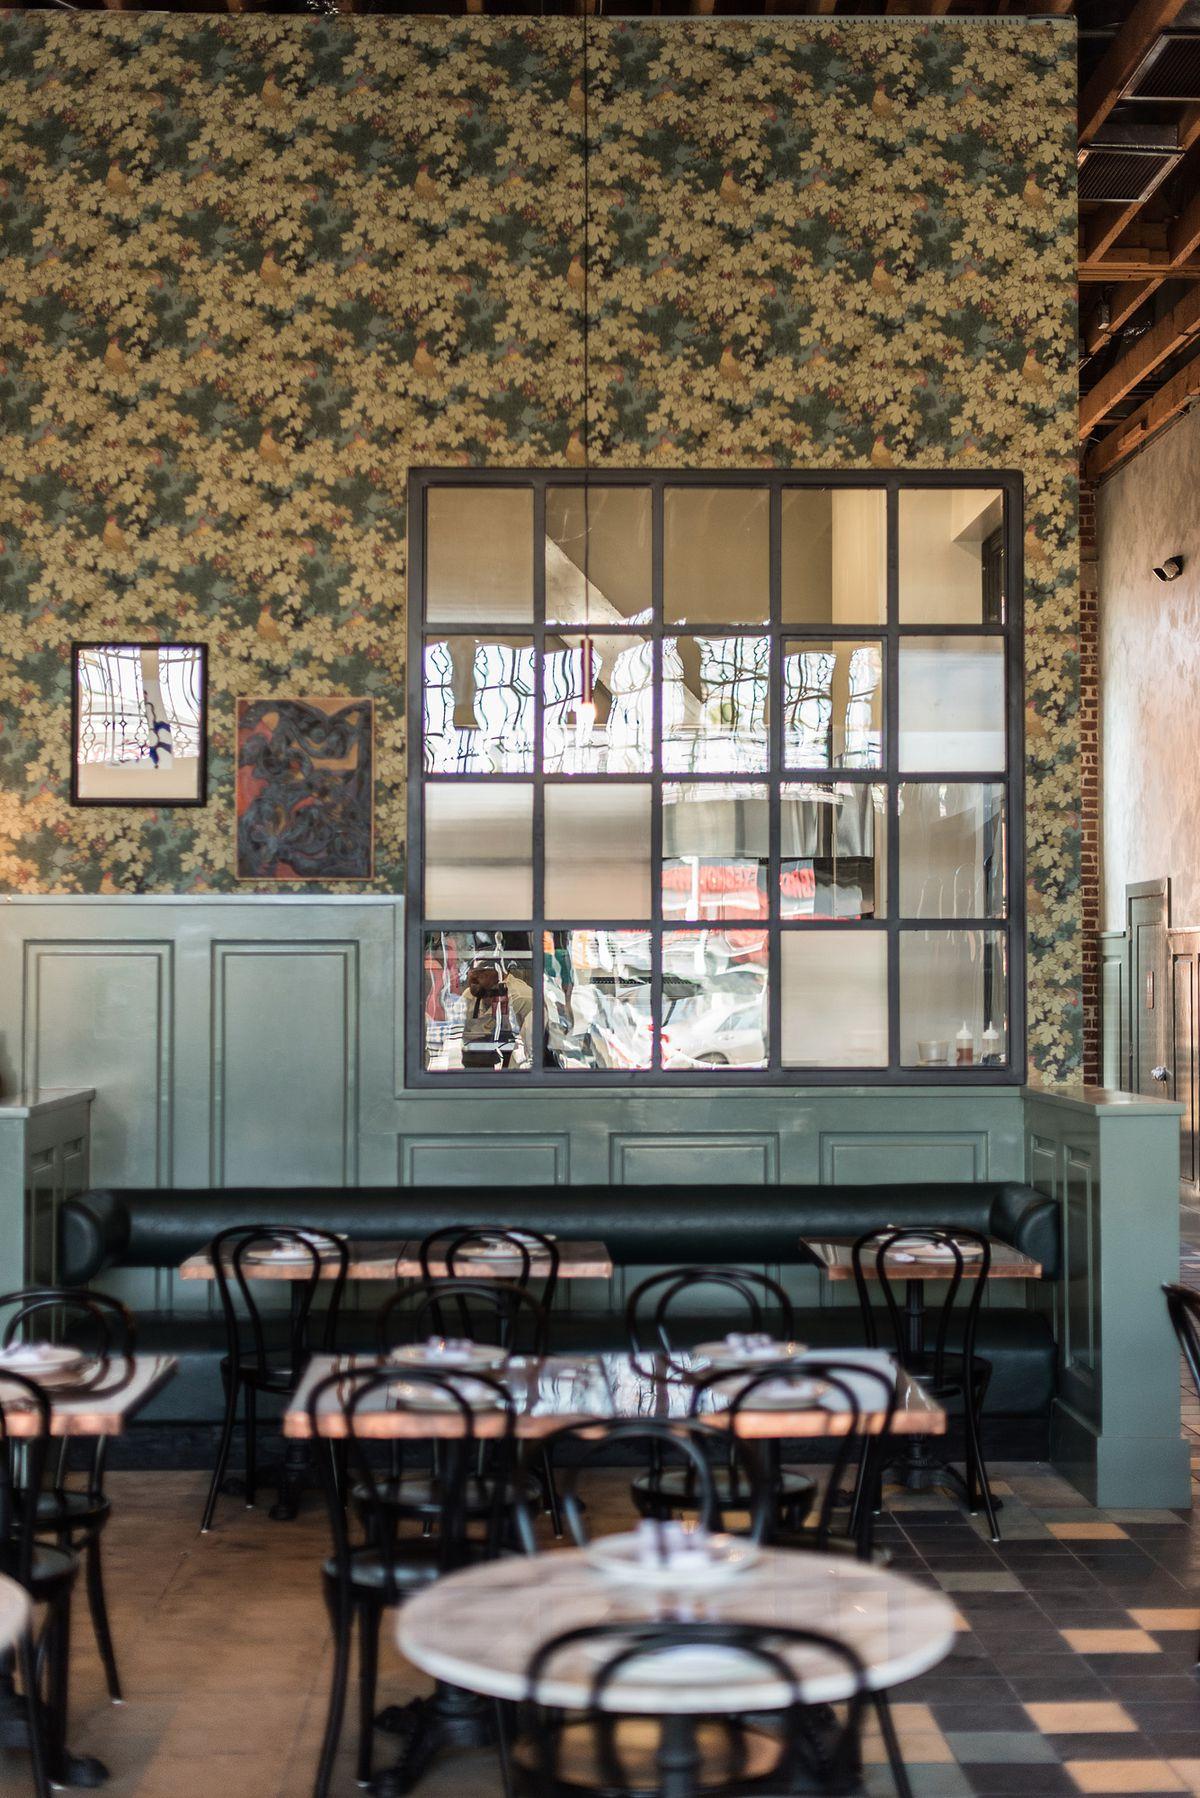 Birdie S Cafe Menu Los Angeles